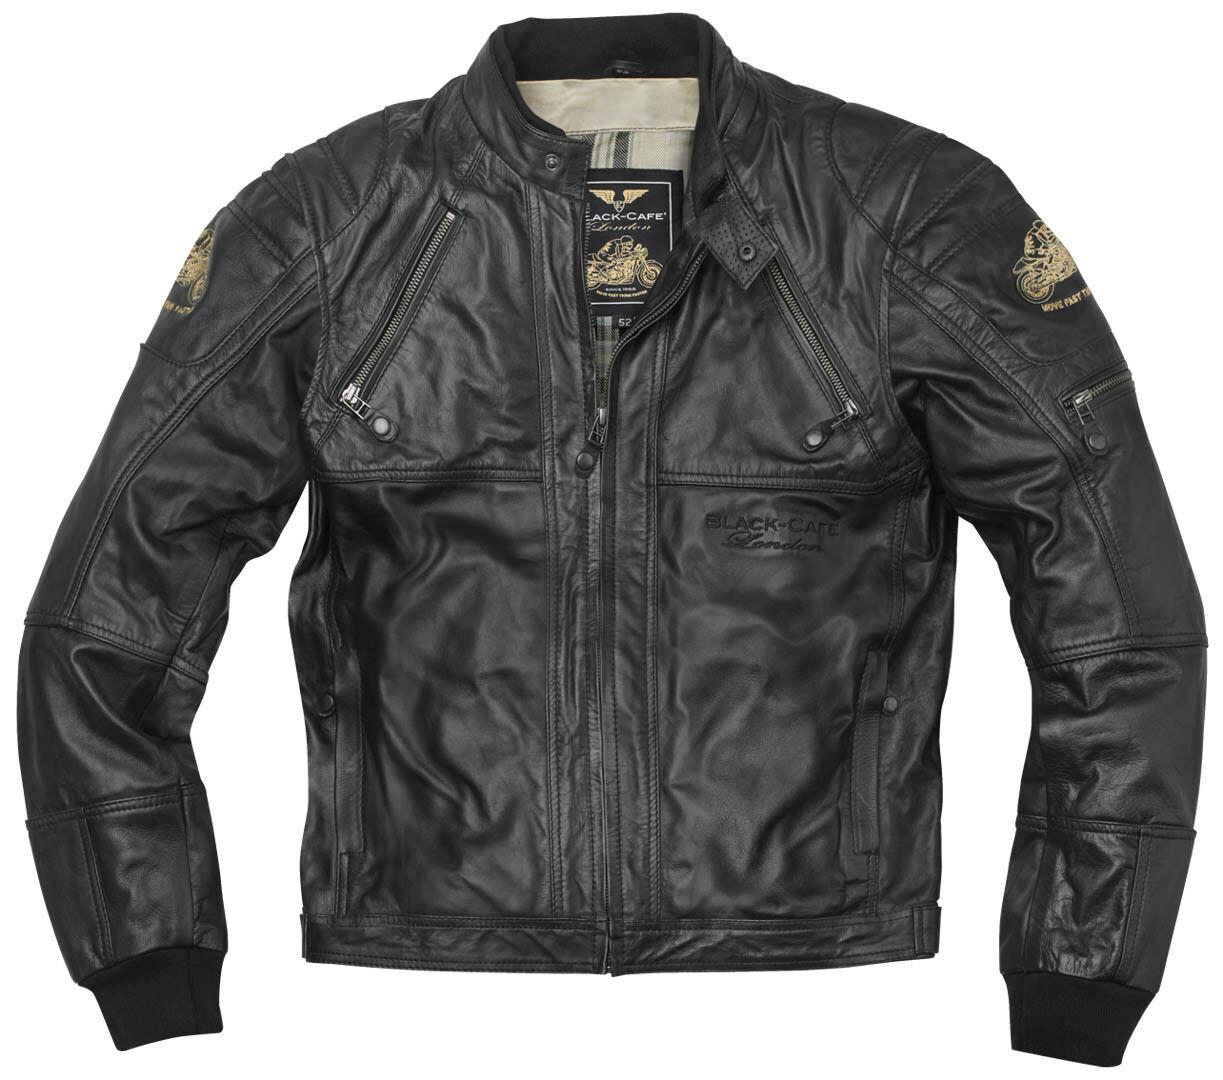 Black-Cafe London Dallas Veste en cuir de moto Noir taille : 56